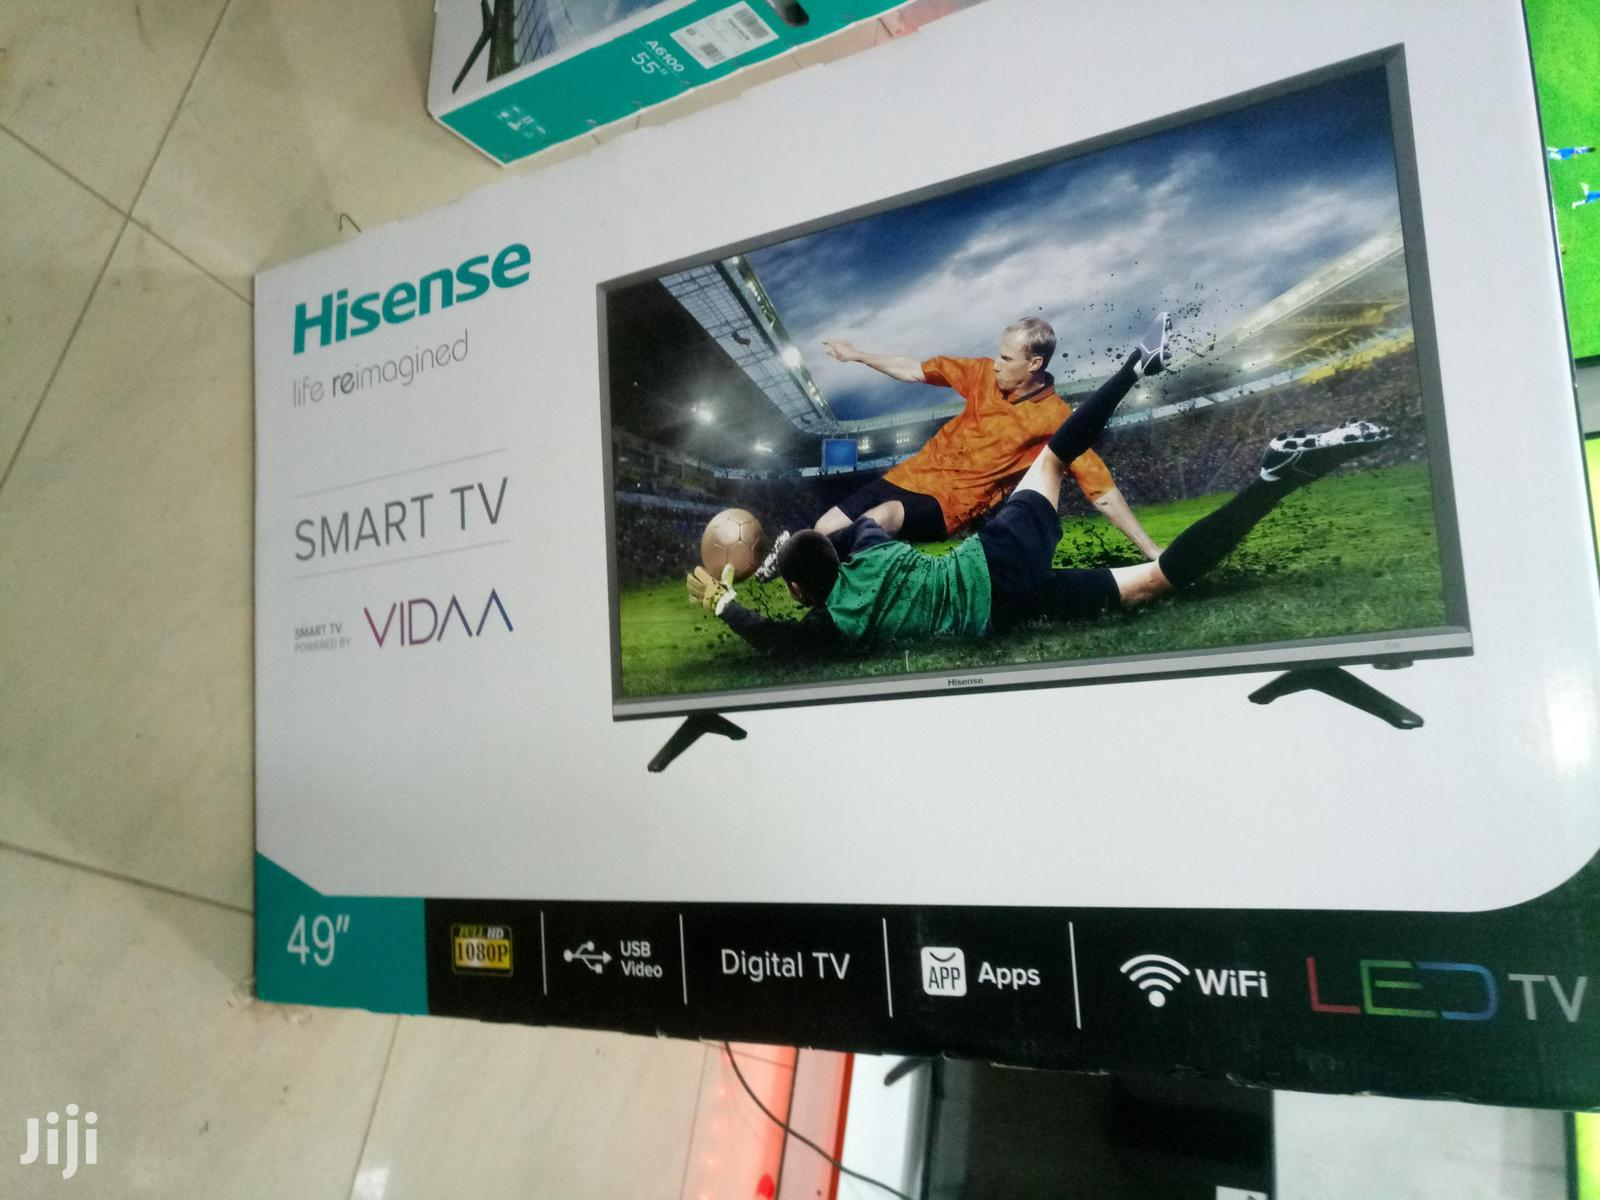 "HISENSE Smart 49"" Flat Screen Digital TV"